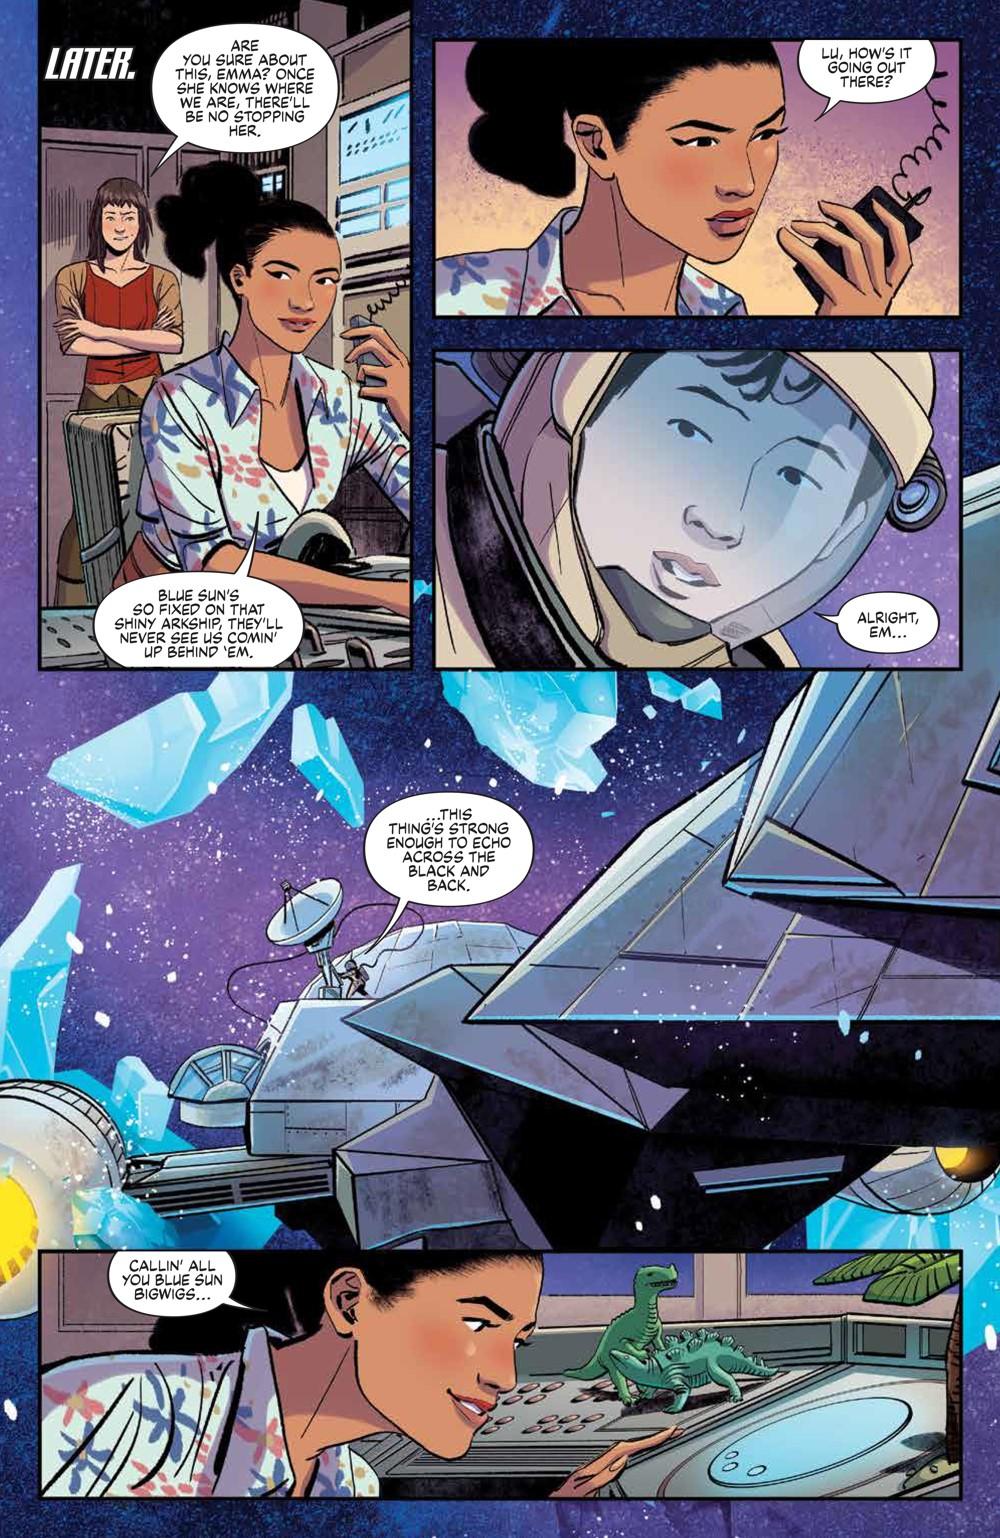 Firefly_BrandNewVerse_006_PRESS_5 ComicList Previews: FIREFLY BRAND NEW 'VERSE #6 (OF 6)